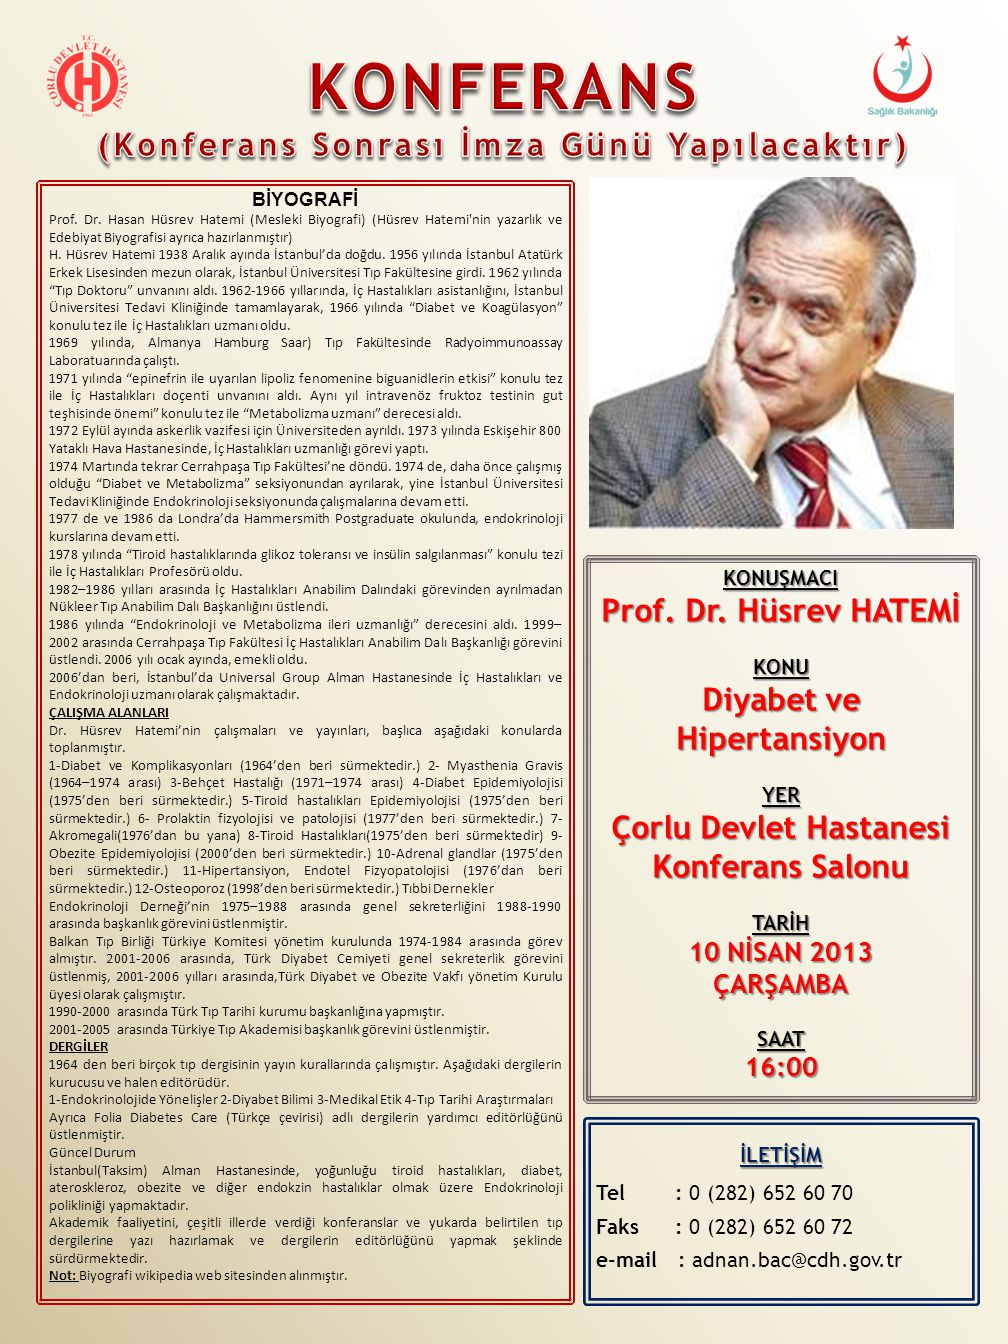 KONUŞMACI Prof.Dr.